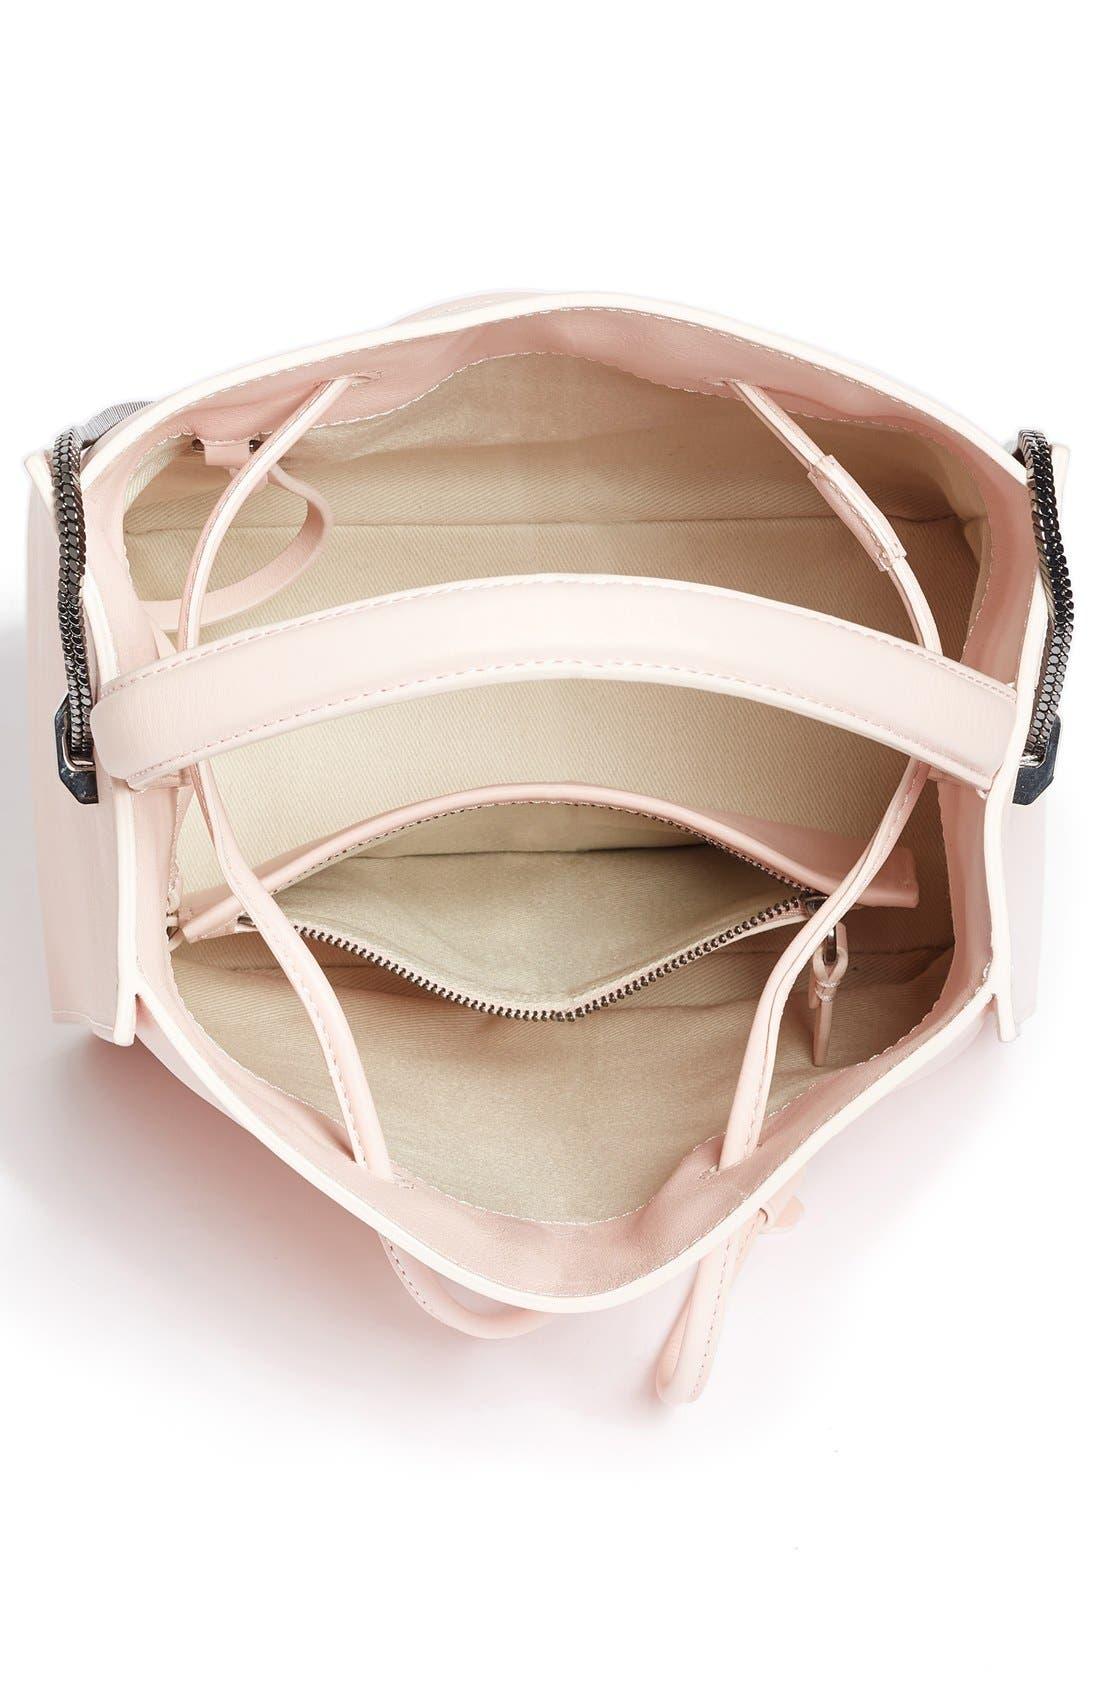 Mini Soleil Leather Bucket Bag,                             Alternate thumbnail 4, color,                             Light Pink